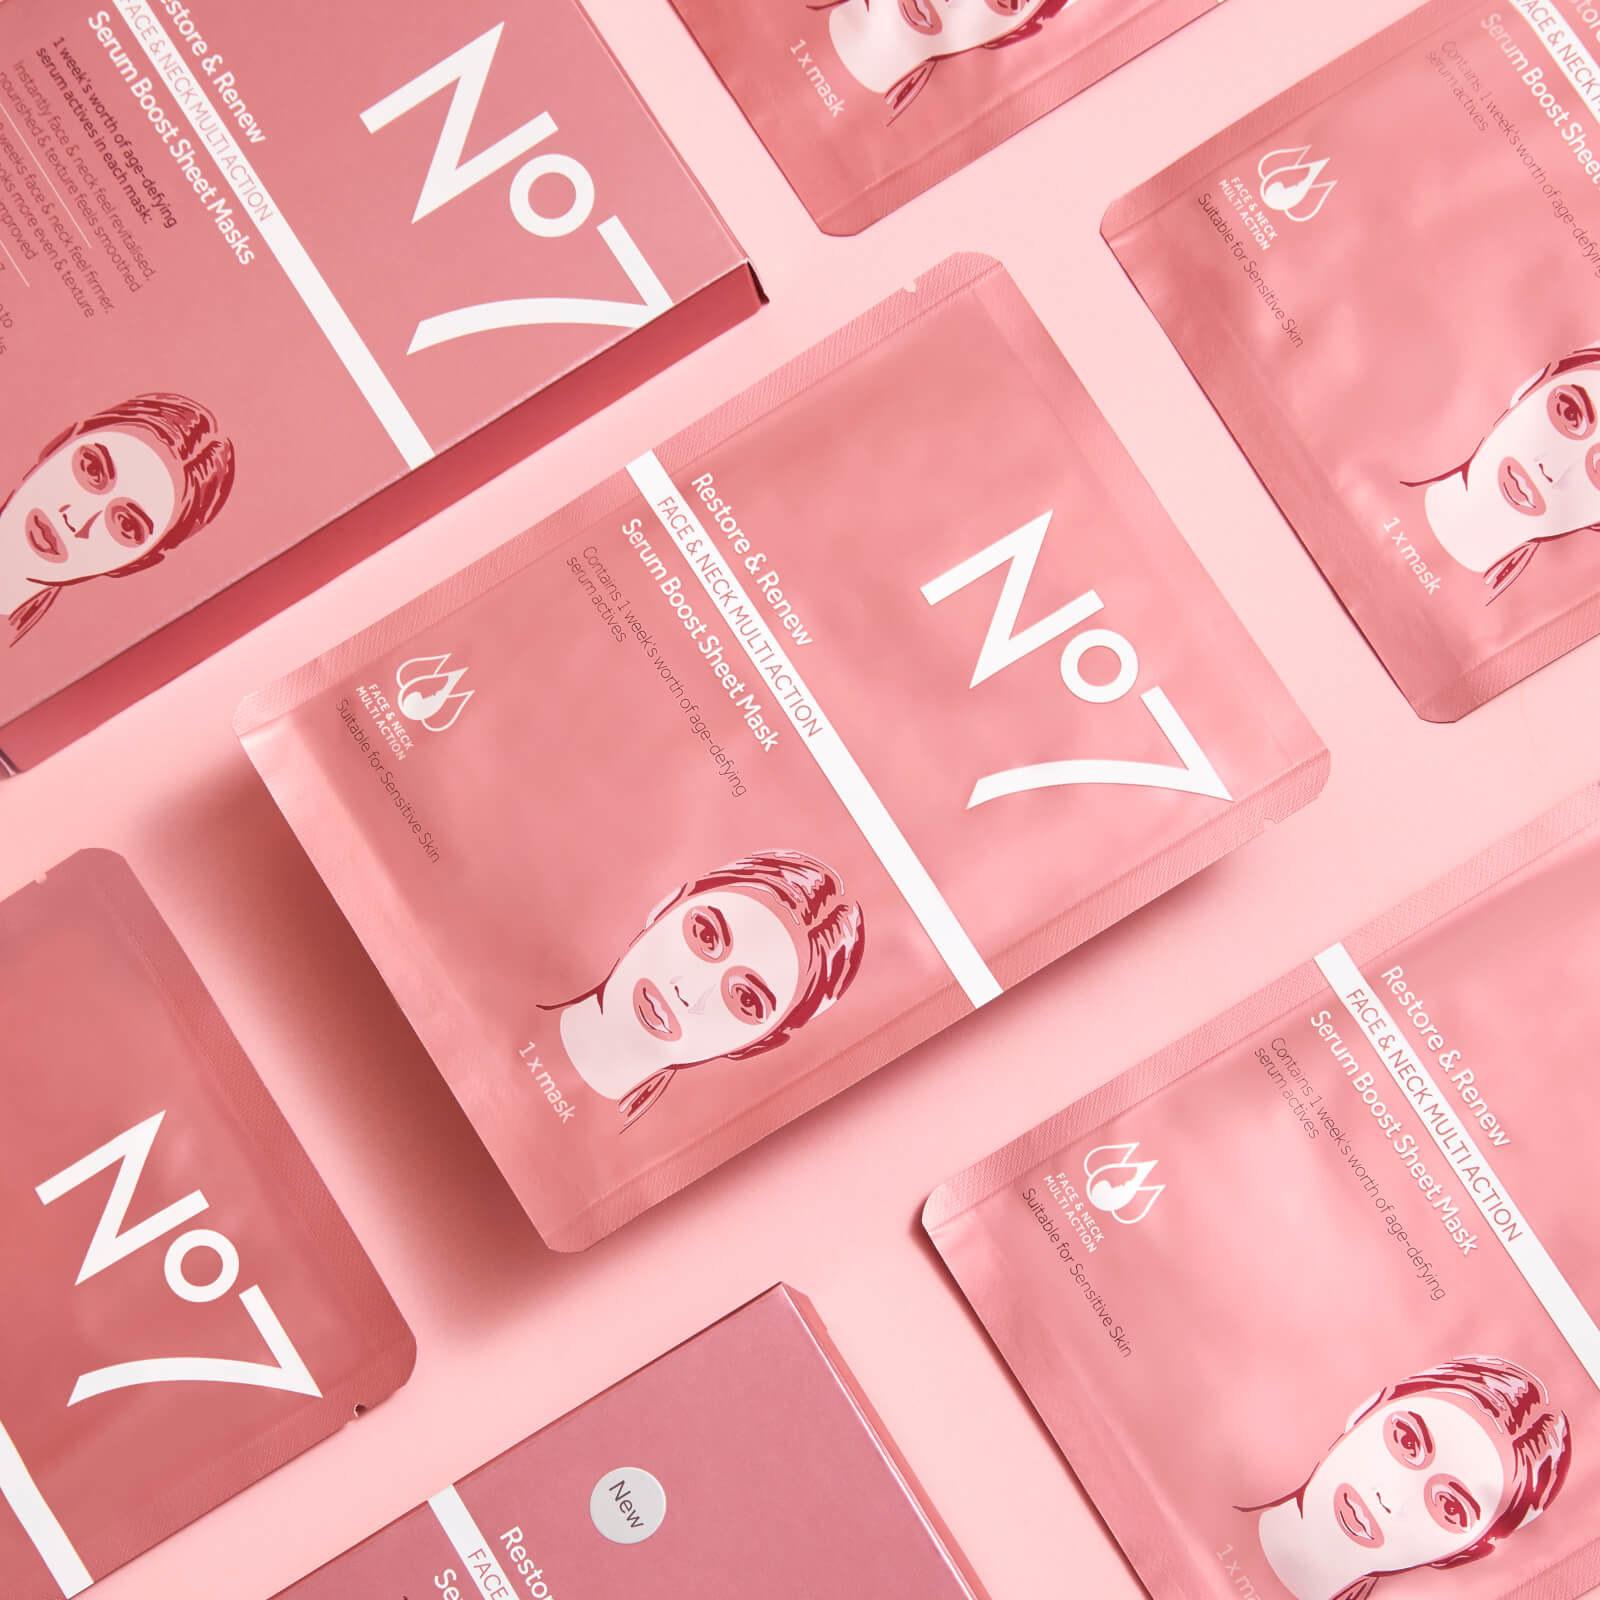 Sheet masks in their packaging